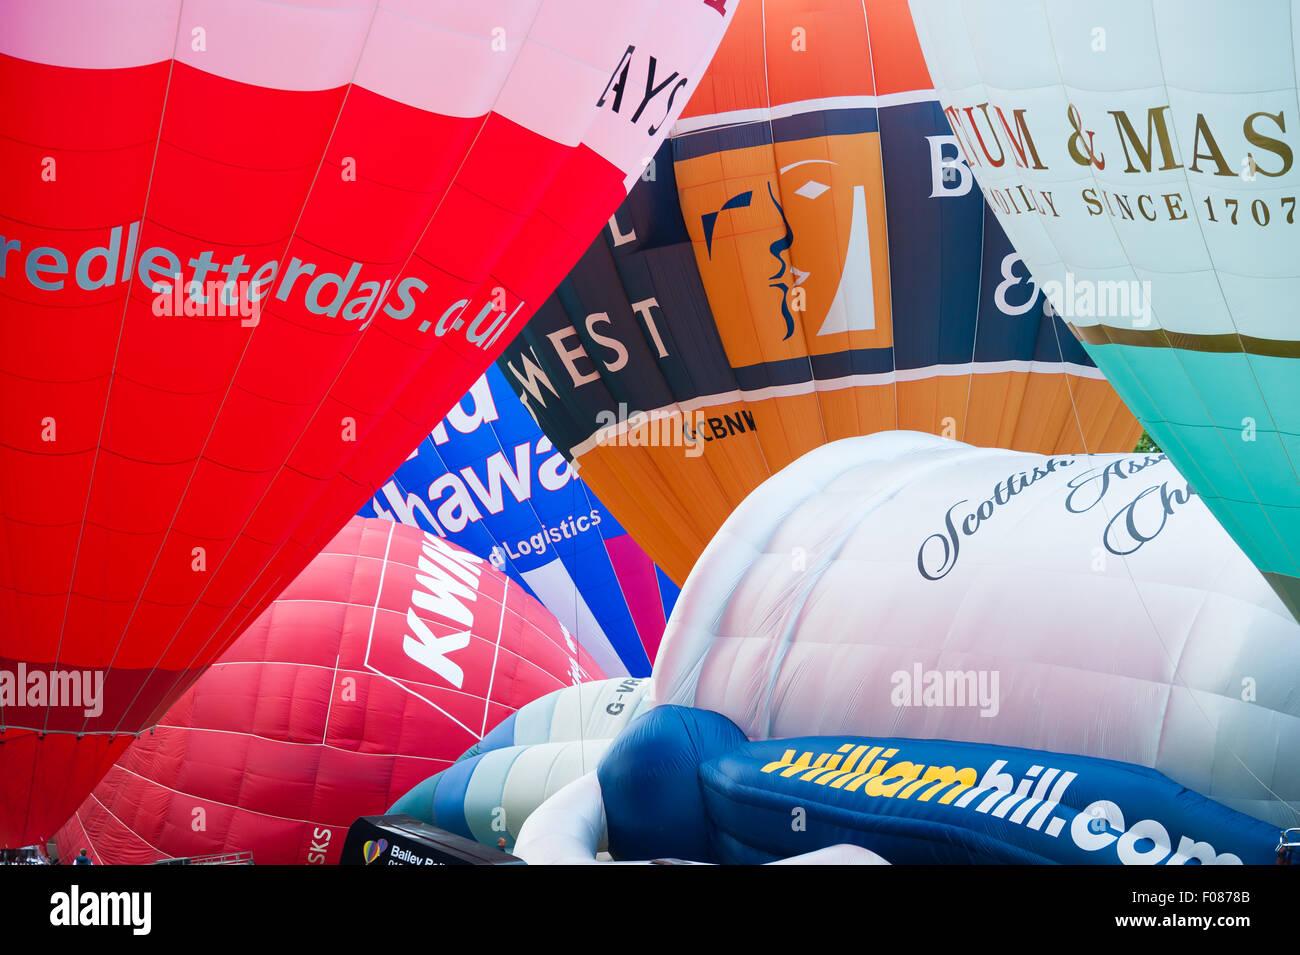 mass ascent hot air balloons - Stock Image